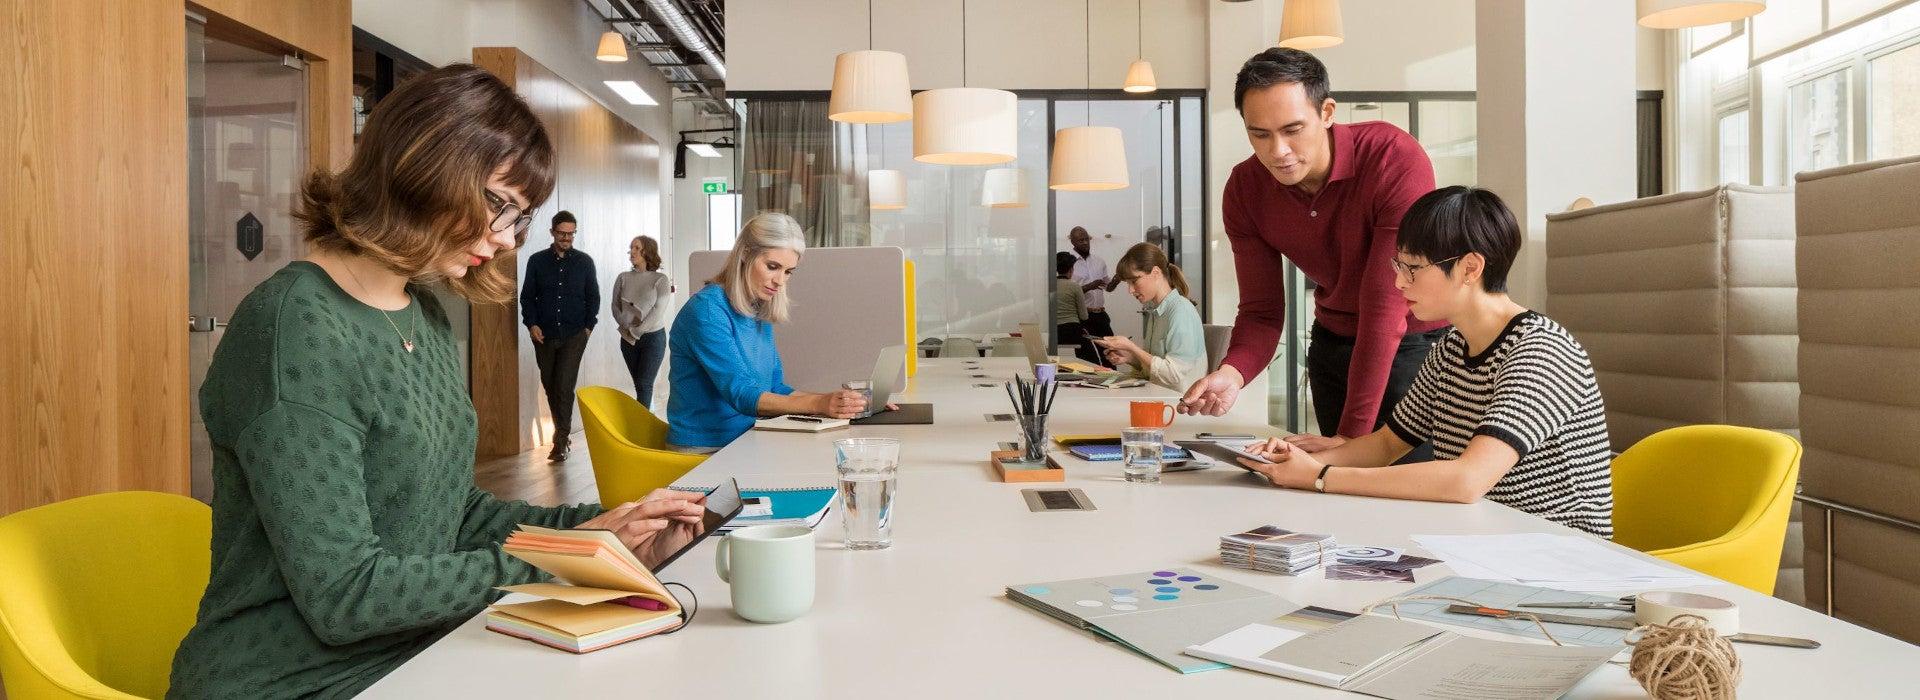 Fuerte comienzo del programa de canal de Konica Minolta Workplace Hub